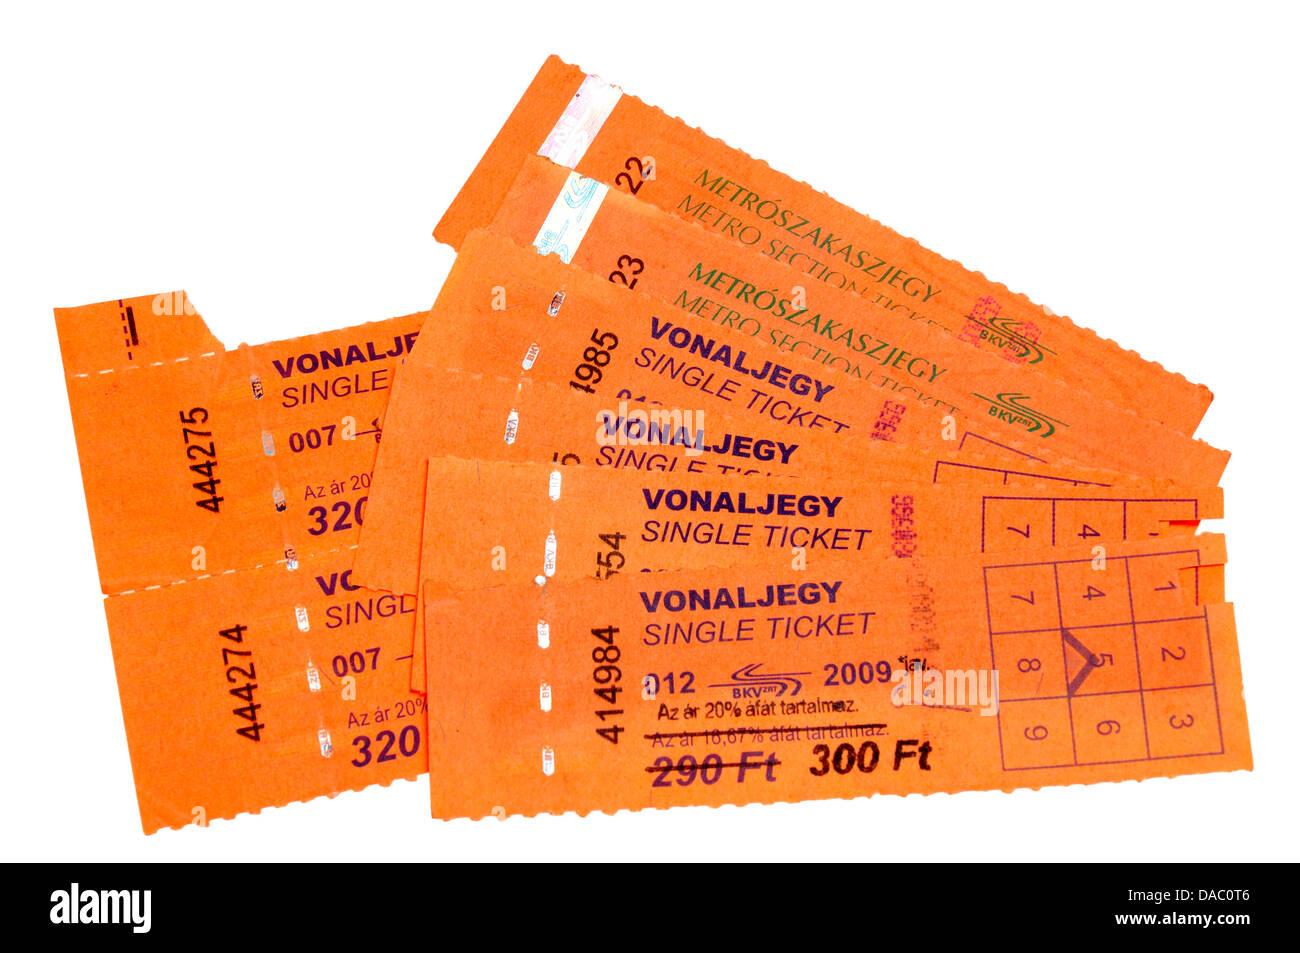 Budapest public transport tickets - Stock Image